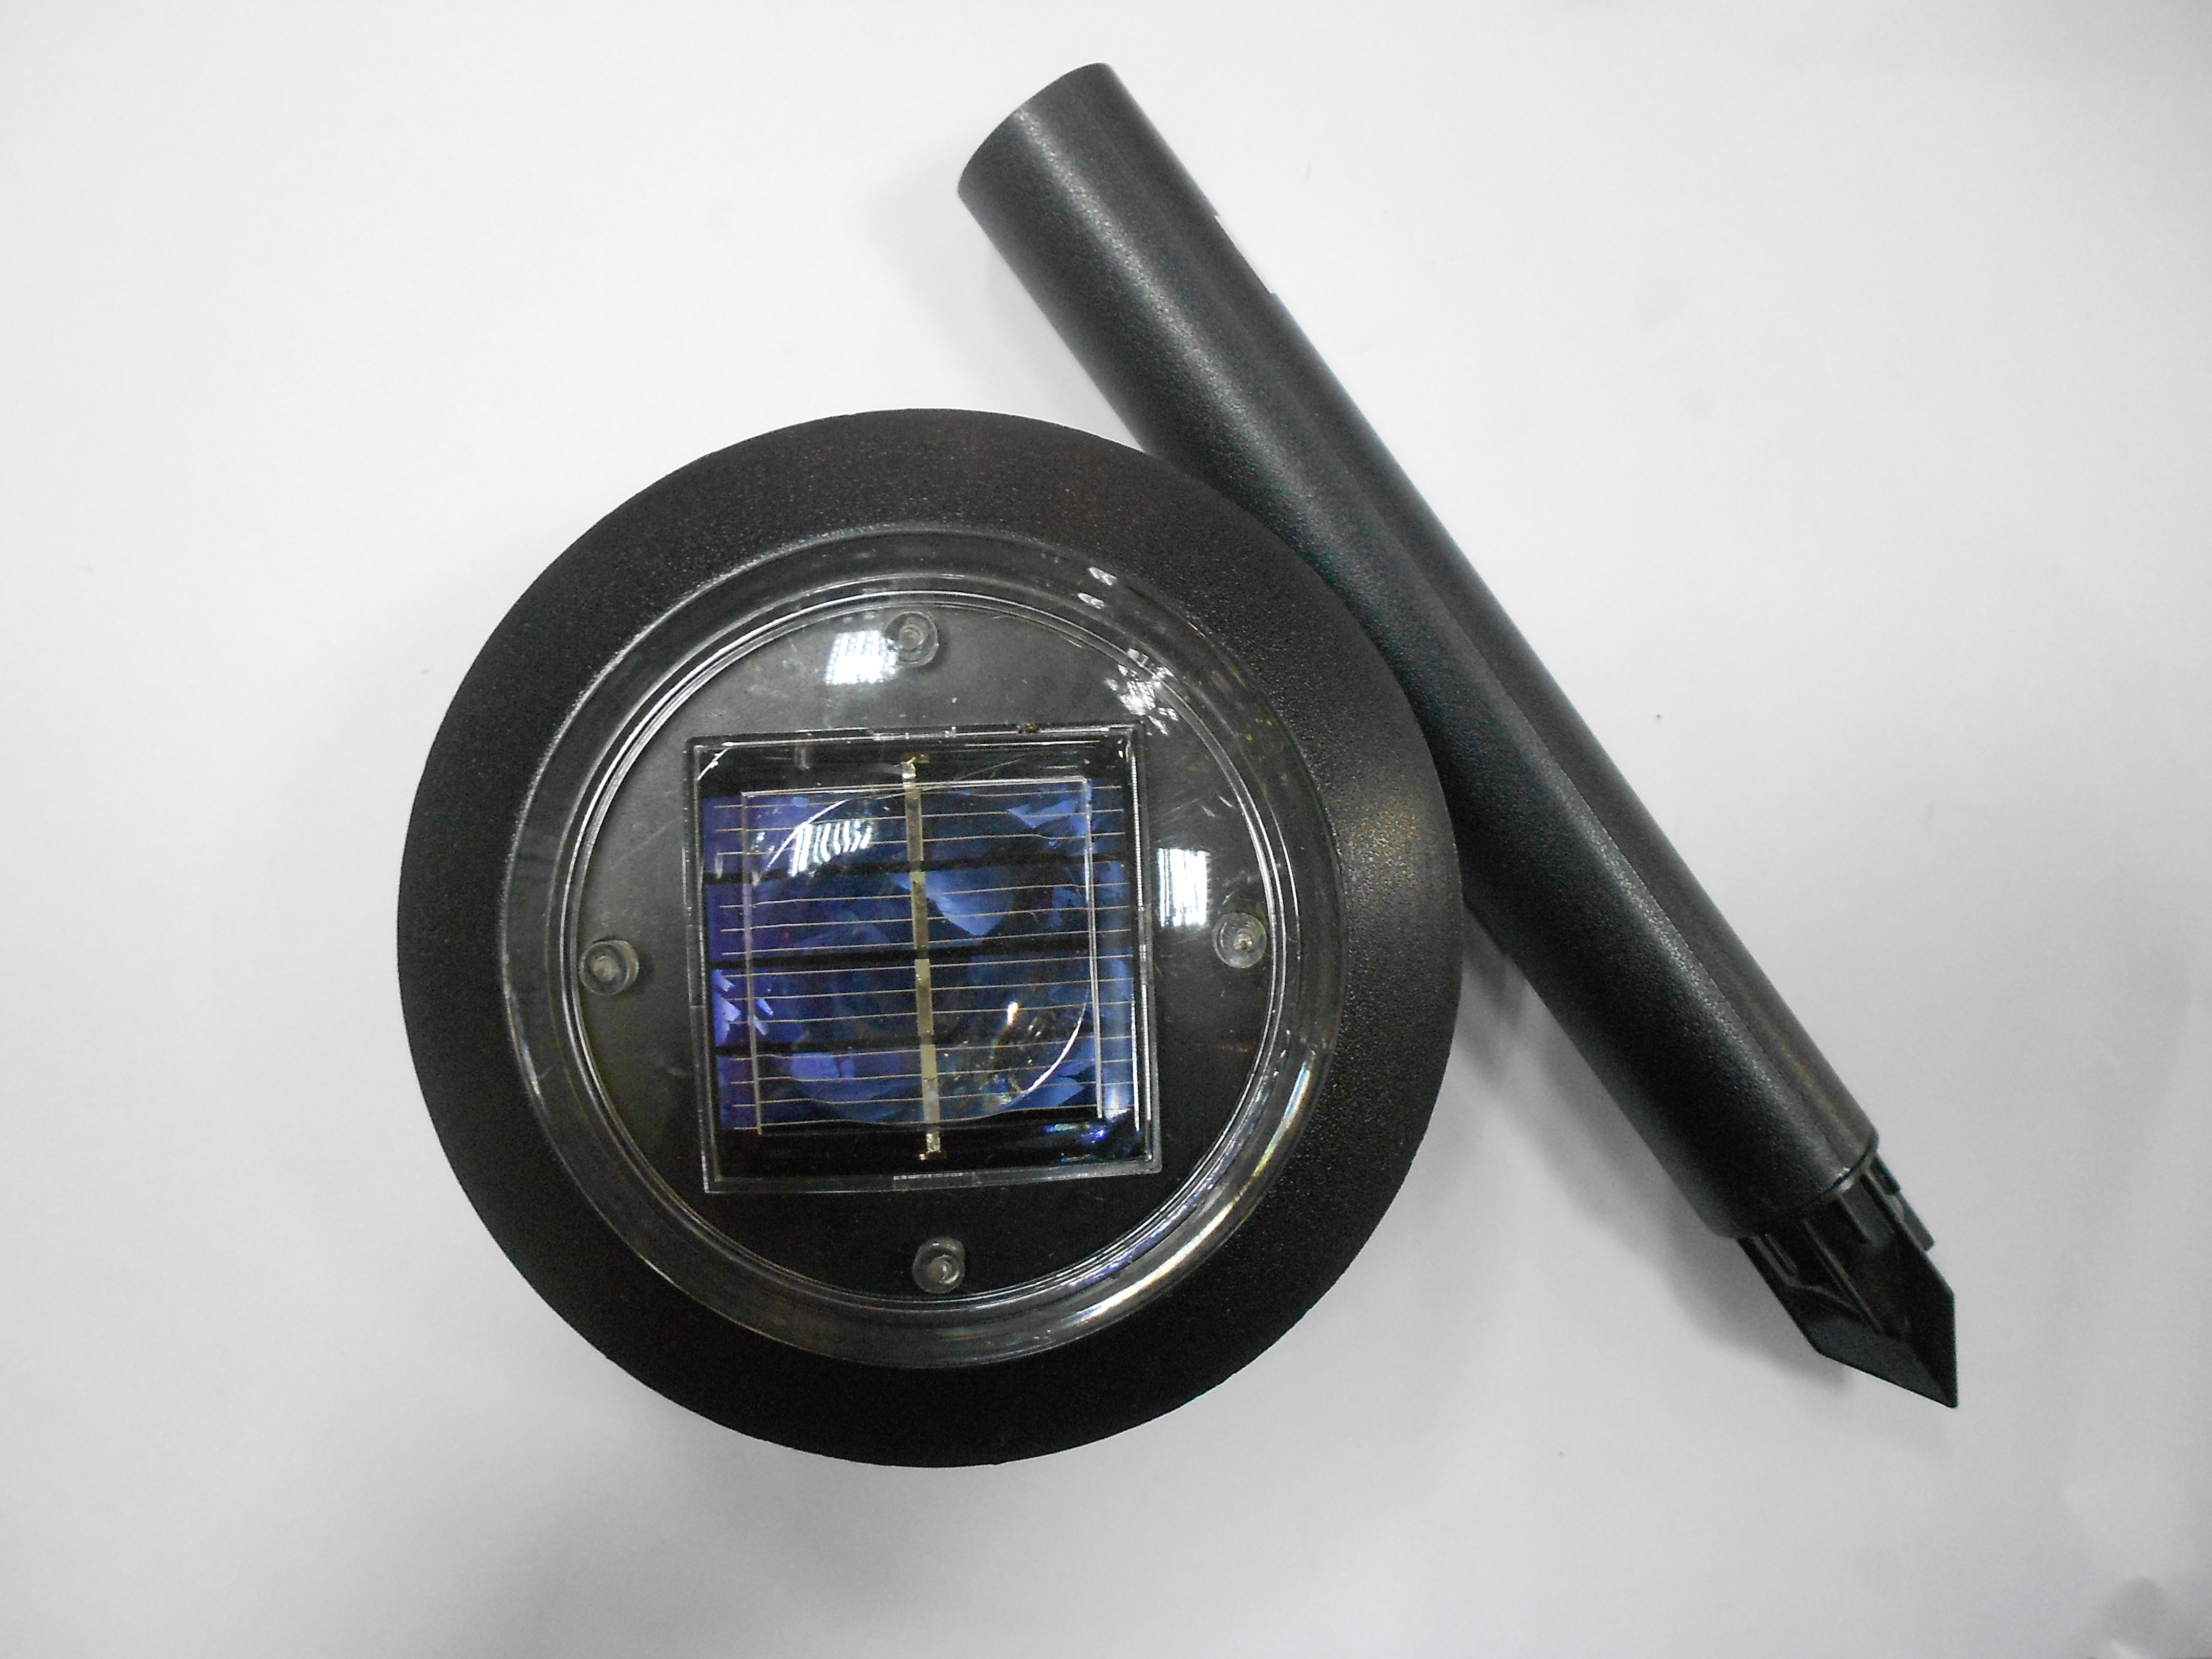 Aplique solar exterior sierra ip40 negro de - Aplique solar exterior ...